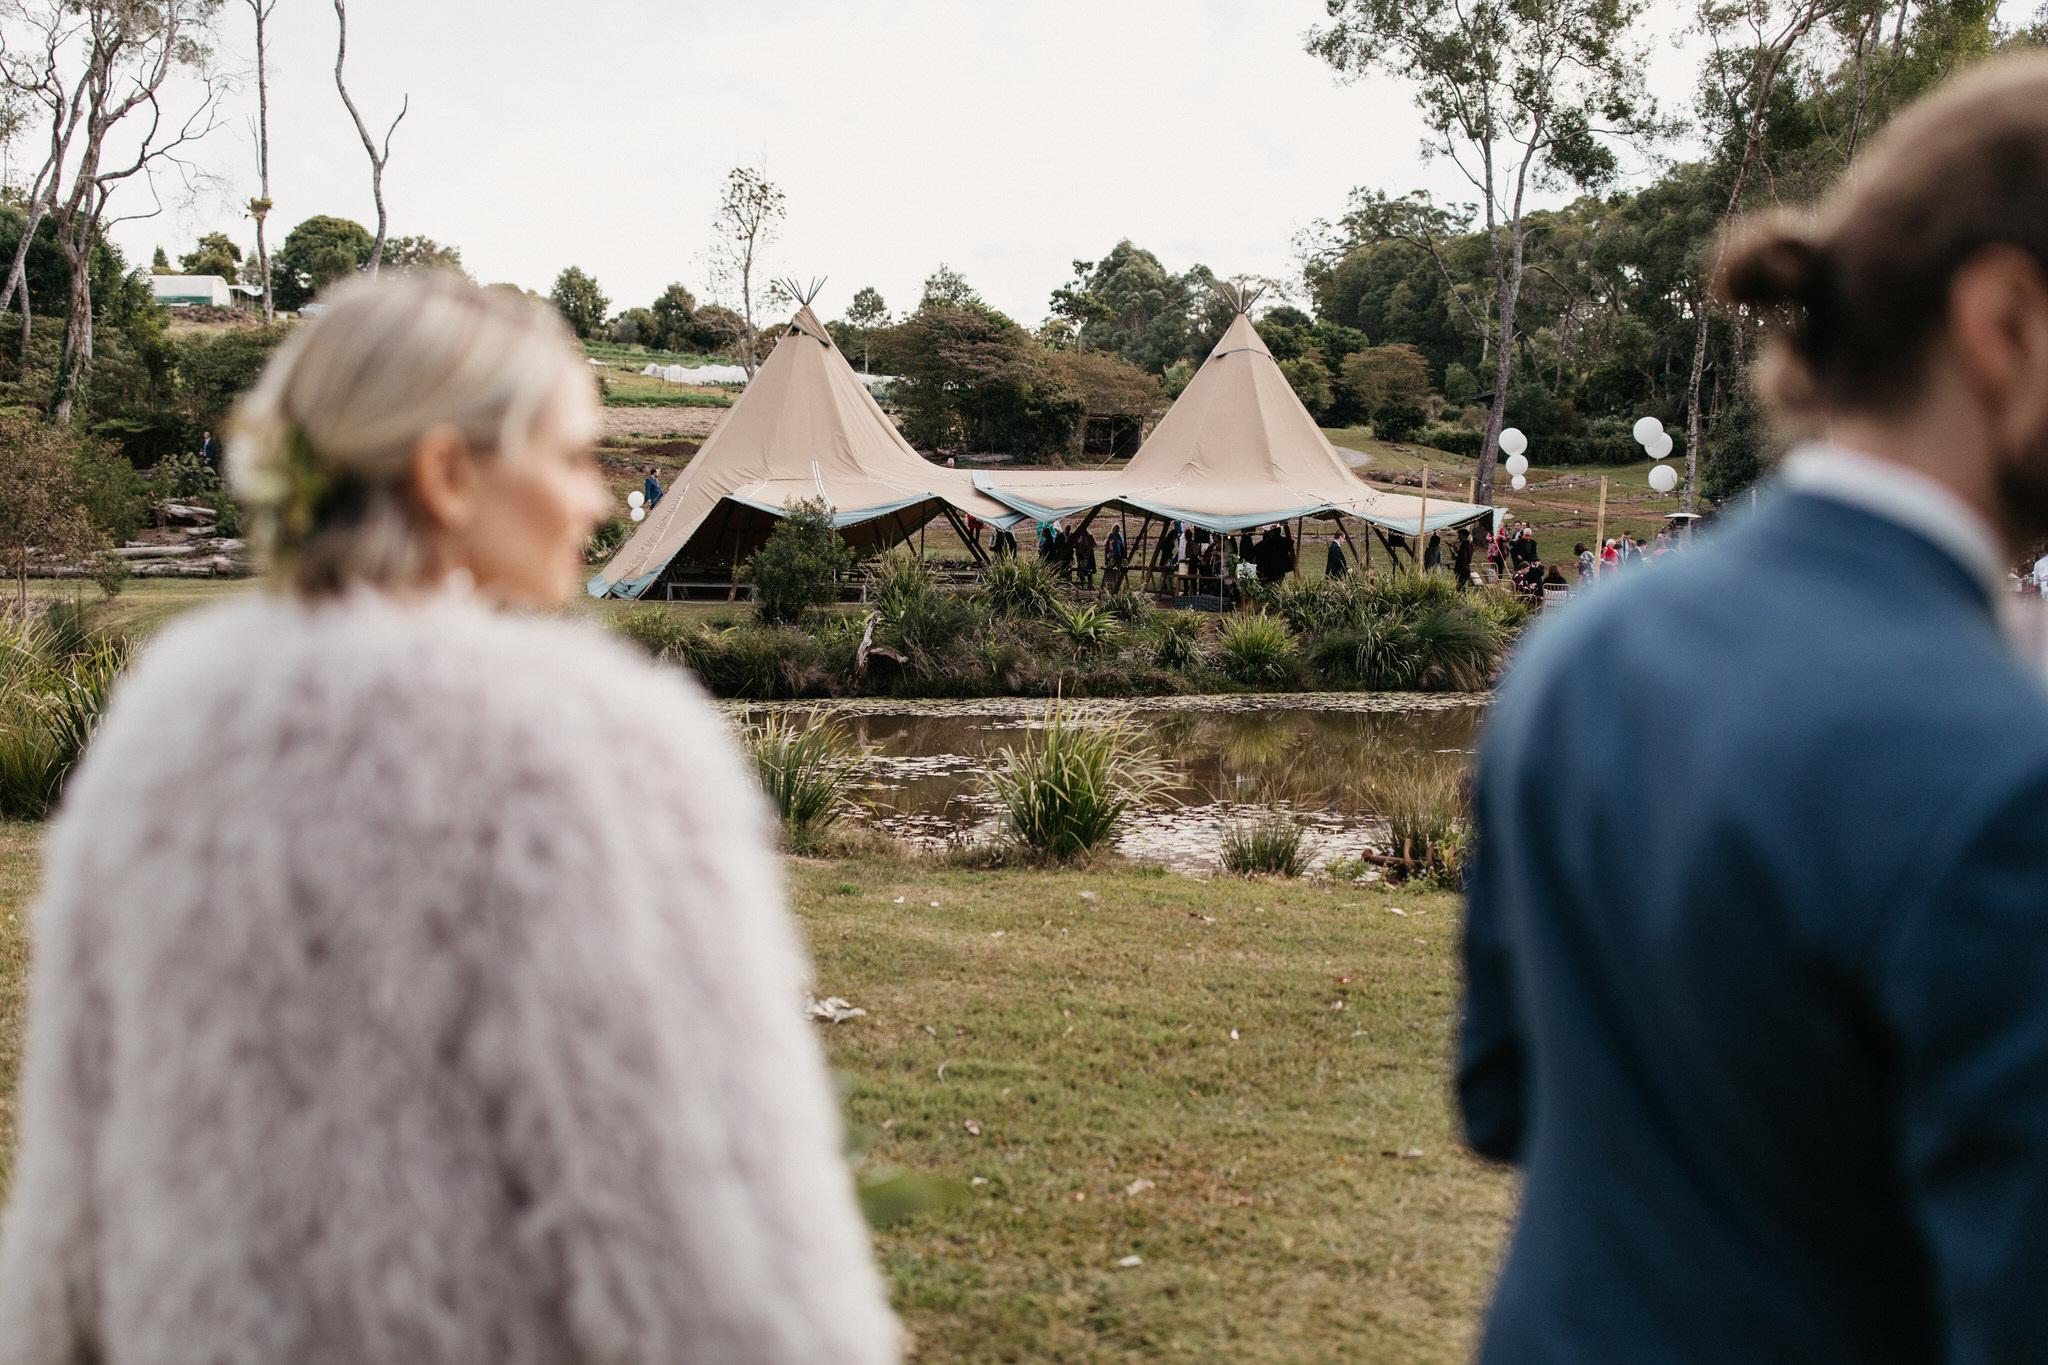 058_SBA-Jen-Tom-Wedding-198.jpg